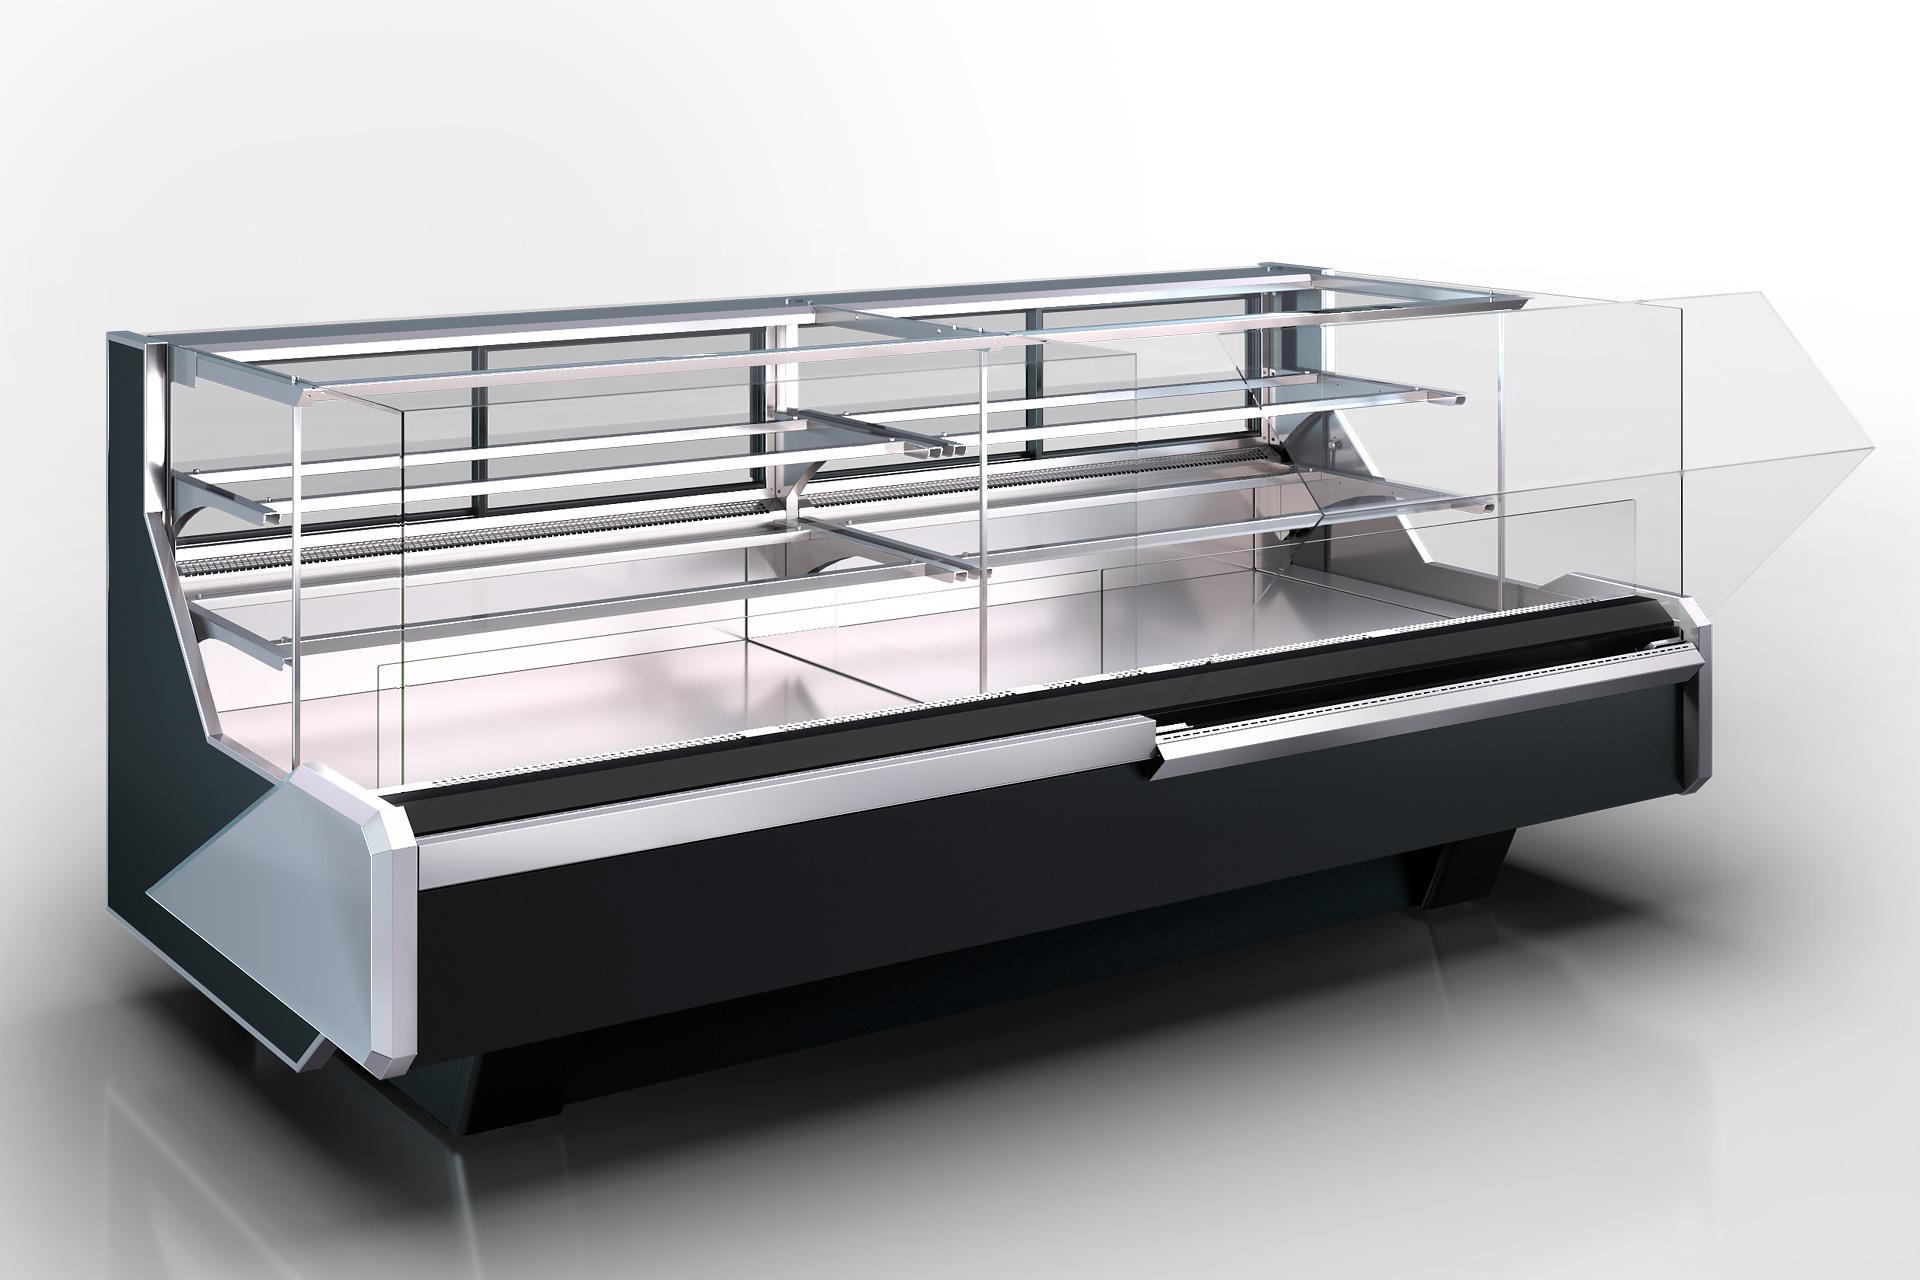 Холодильная витрина Missouri enigma MC 122 patisserie OS 115-DLM (option)